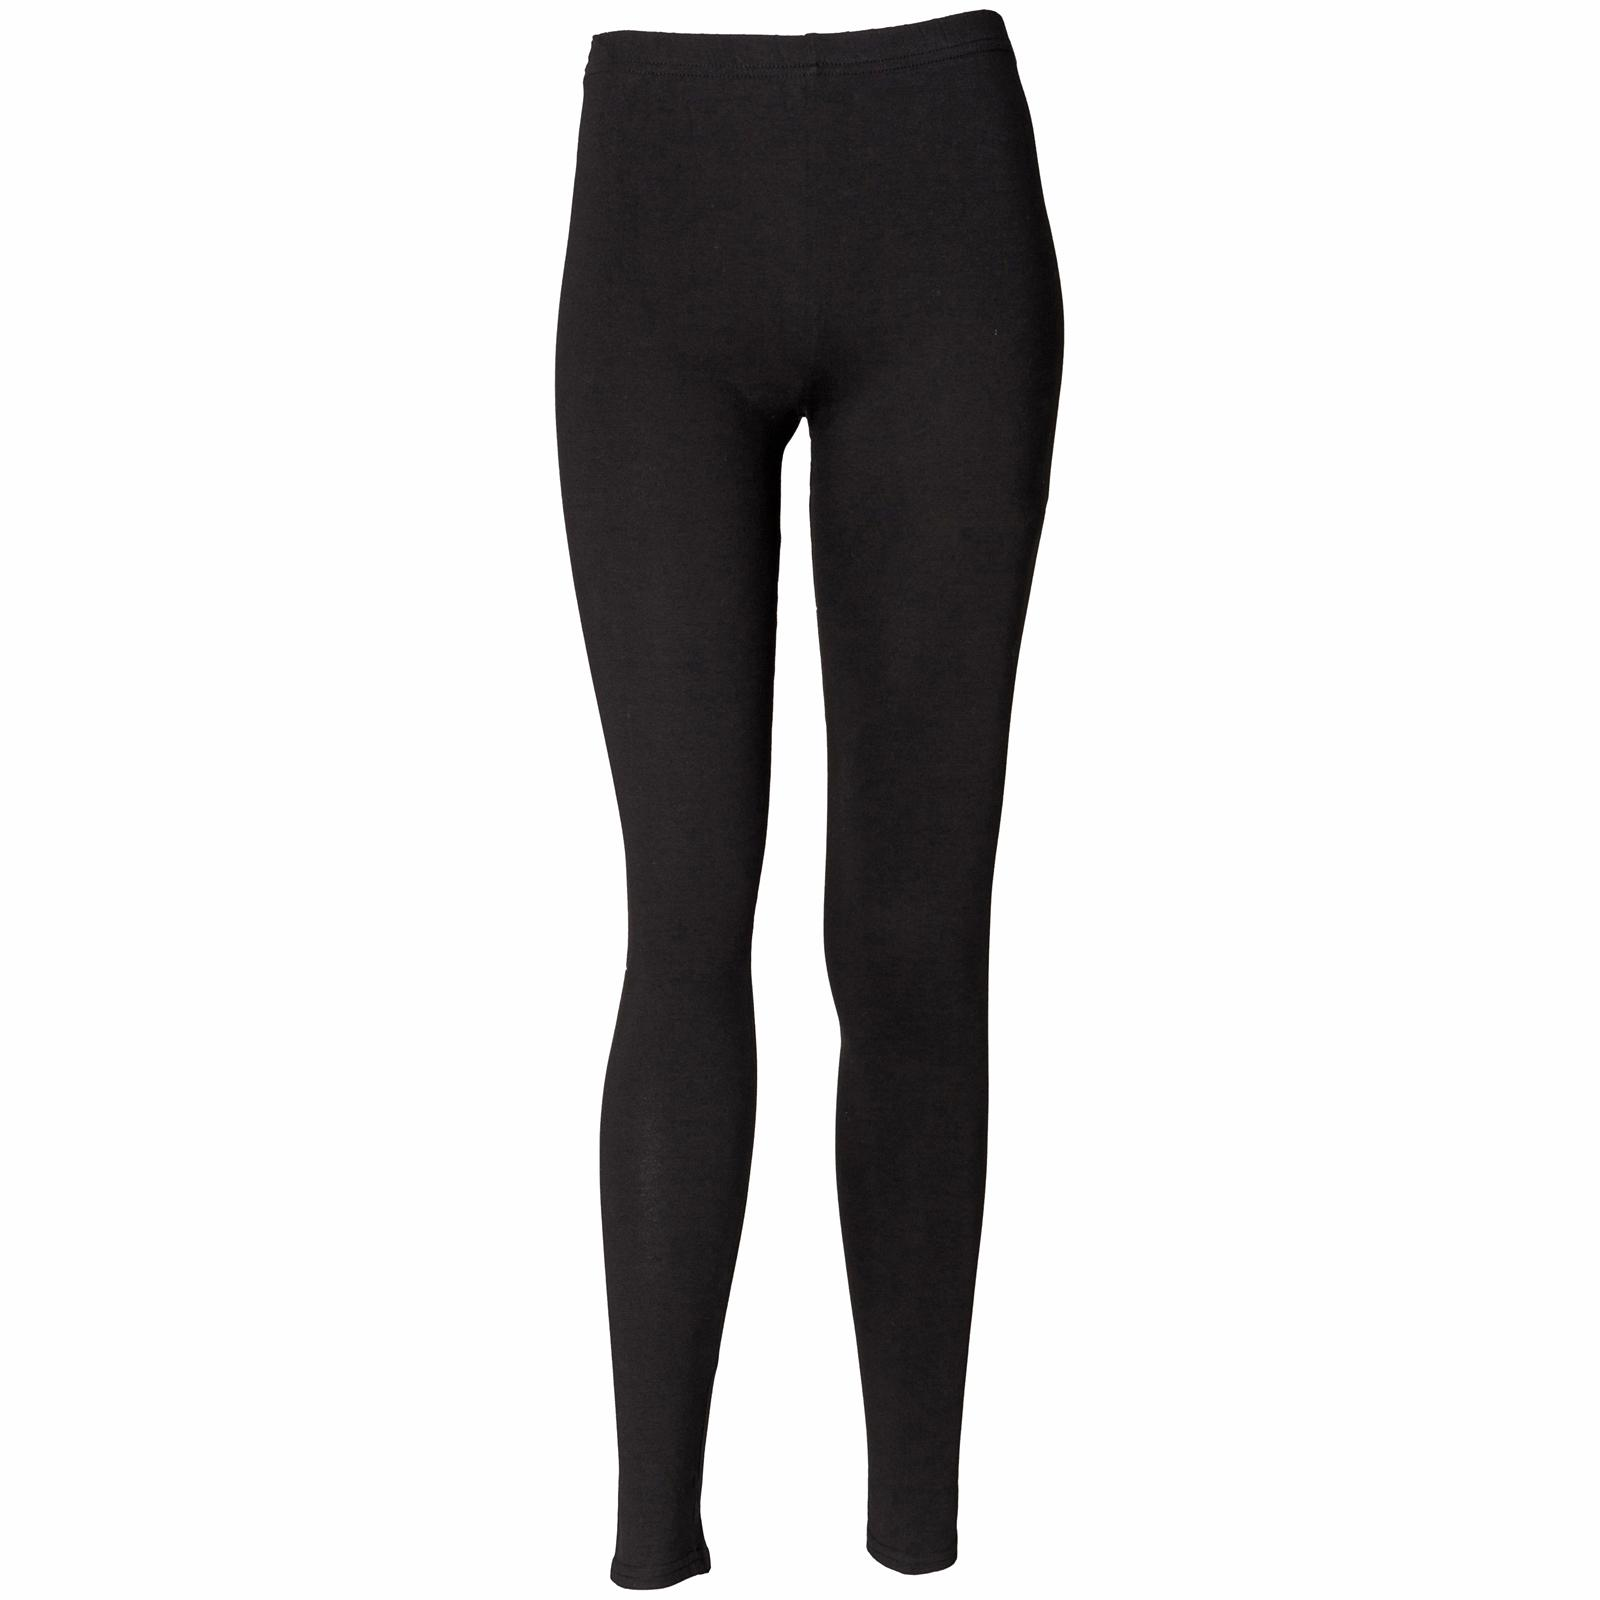 New-SKINNI-FIT-Womens-Ladies-Elasticated-Leggings-in-Black-S-XL